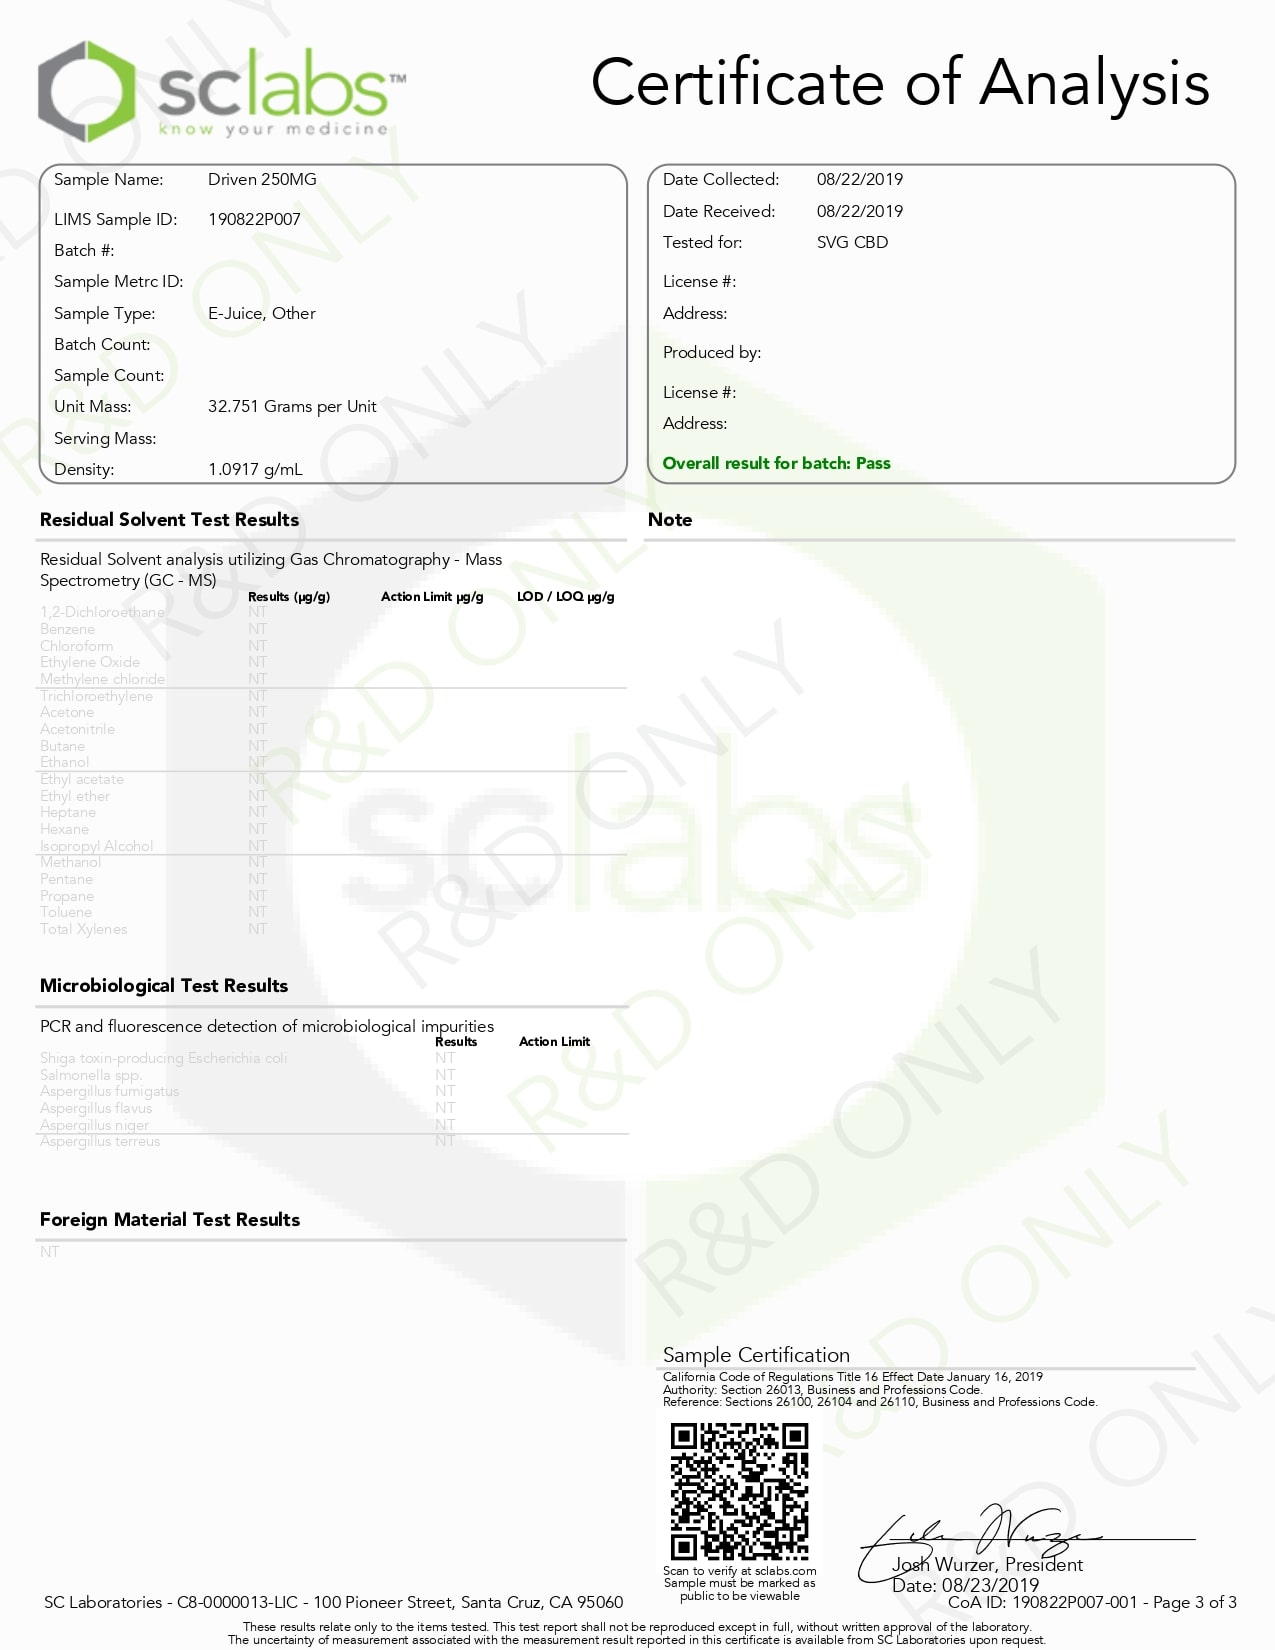 SAVAGE Driven CBD Vape Juice 250mg Lab Report